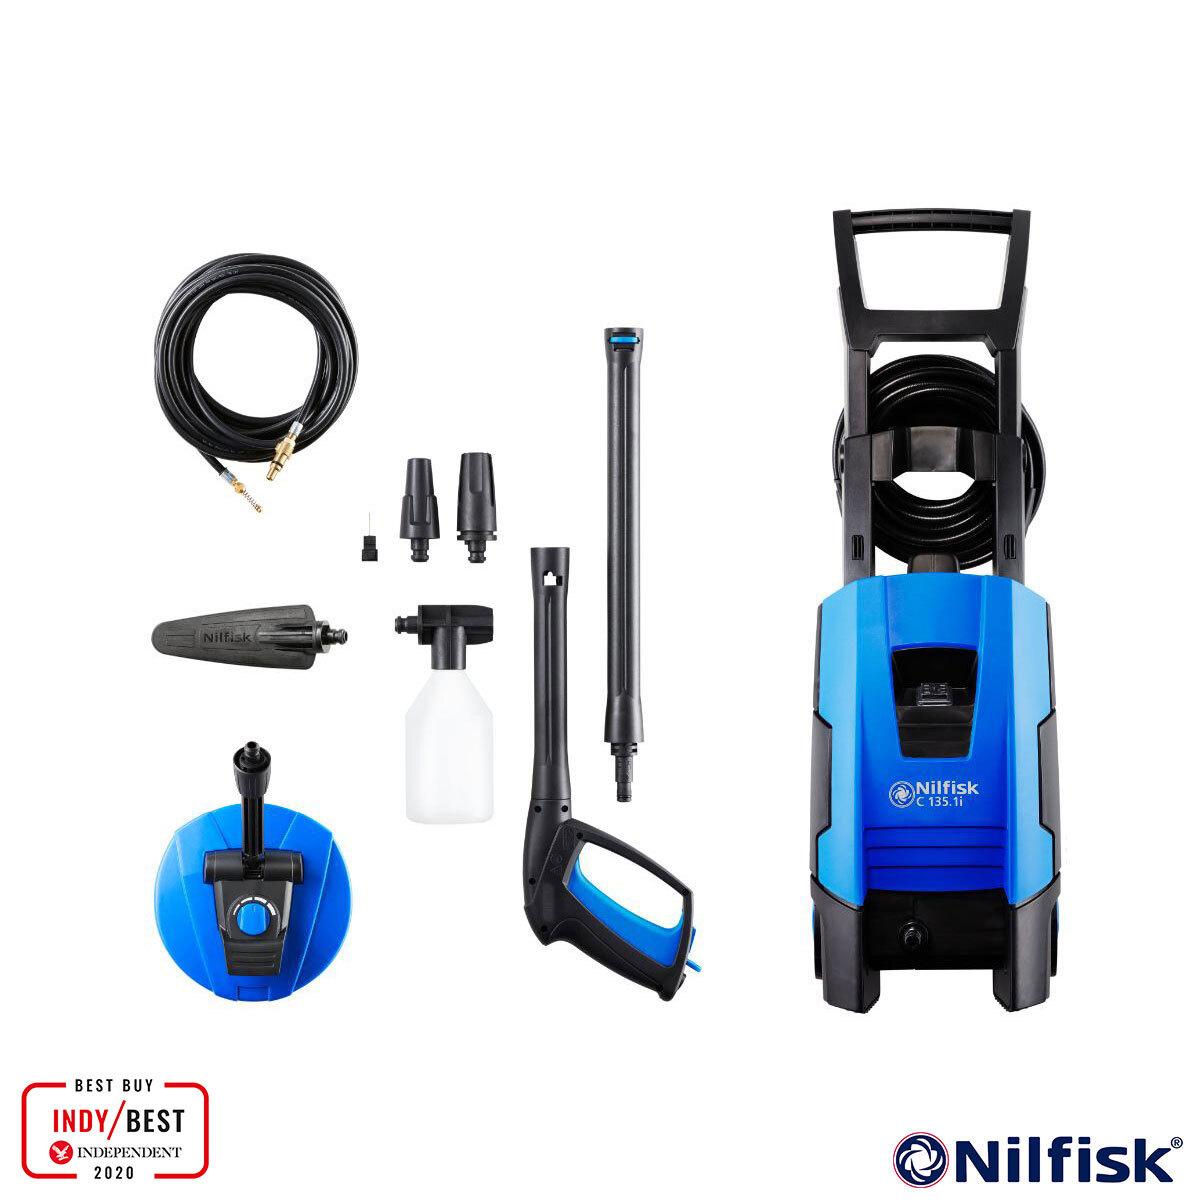 Nilfisk C135.1-8i Maintenance Pressure Washer - £149.99 delivered at Costco